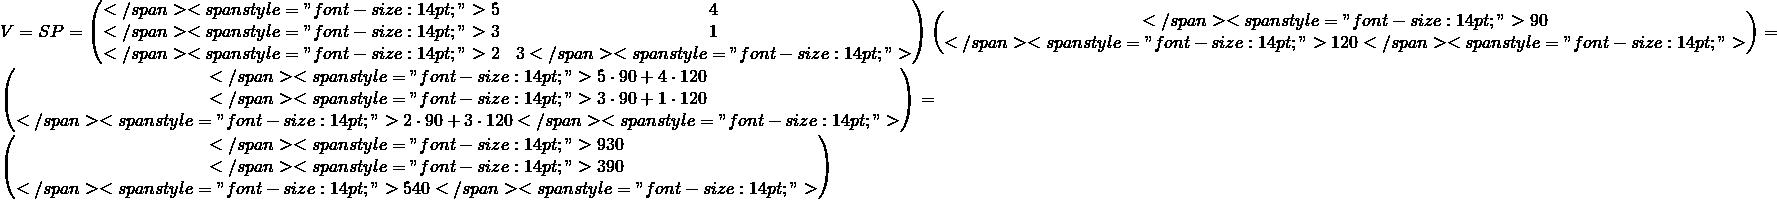 "V=SP=\begin{pmatrix}</span> <span style=""font-size: 14pt;"">5 &4 \\</span> <span style=""font-size: 14pt;"">3 &1 \\</span> <span style=""font-size: 14pt;"">2& 3</span> <span style=""font-size: 14pt;"">\end{pmatrix}\begin{pmatrix}</span> <span style=""font-size: 14pt;"">90\\</span> <span style=""font-size: 14pt;"">120</span> <span style=""font-size: 14pt;"">\end{pmatrix}=\begin{pmatrix}</span> <span style=""font-size: 14pt;"">5\cdot 90+4\cdot 120\\</span> <span style=""font-size: 14pt;"">3\cdot 90+1\cdot 120\\</span> <span style=""font-size: 14pt;"">2\cdot 90+3\cdot 120</span> <span style=""font-size: 14pt;"">\end{pmatrix}=\begin{pmatrix}</span> <span style=""font-size: 14pt;"">930\\</span> <span style=""font-size: 14pt;"">390\\</span> <span style=""font-size: 14pt;"">540</span> <span style=""font-size: 14pt;"">\end{pmatrix}"